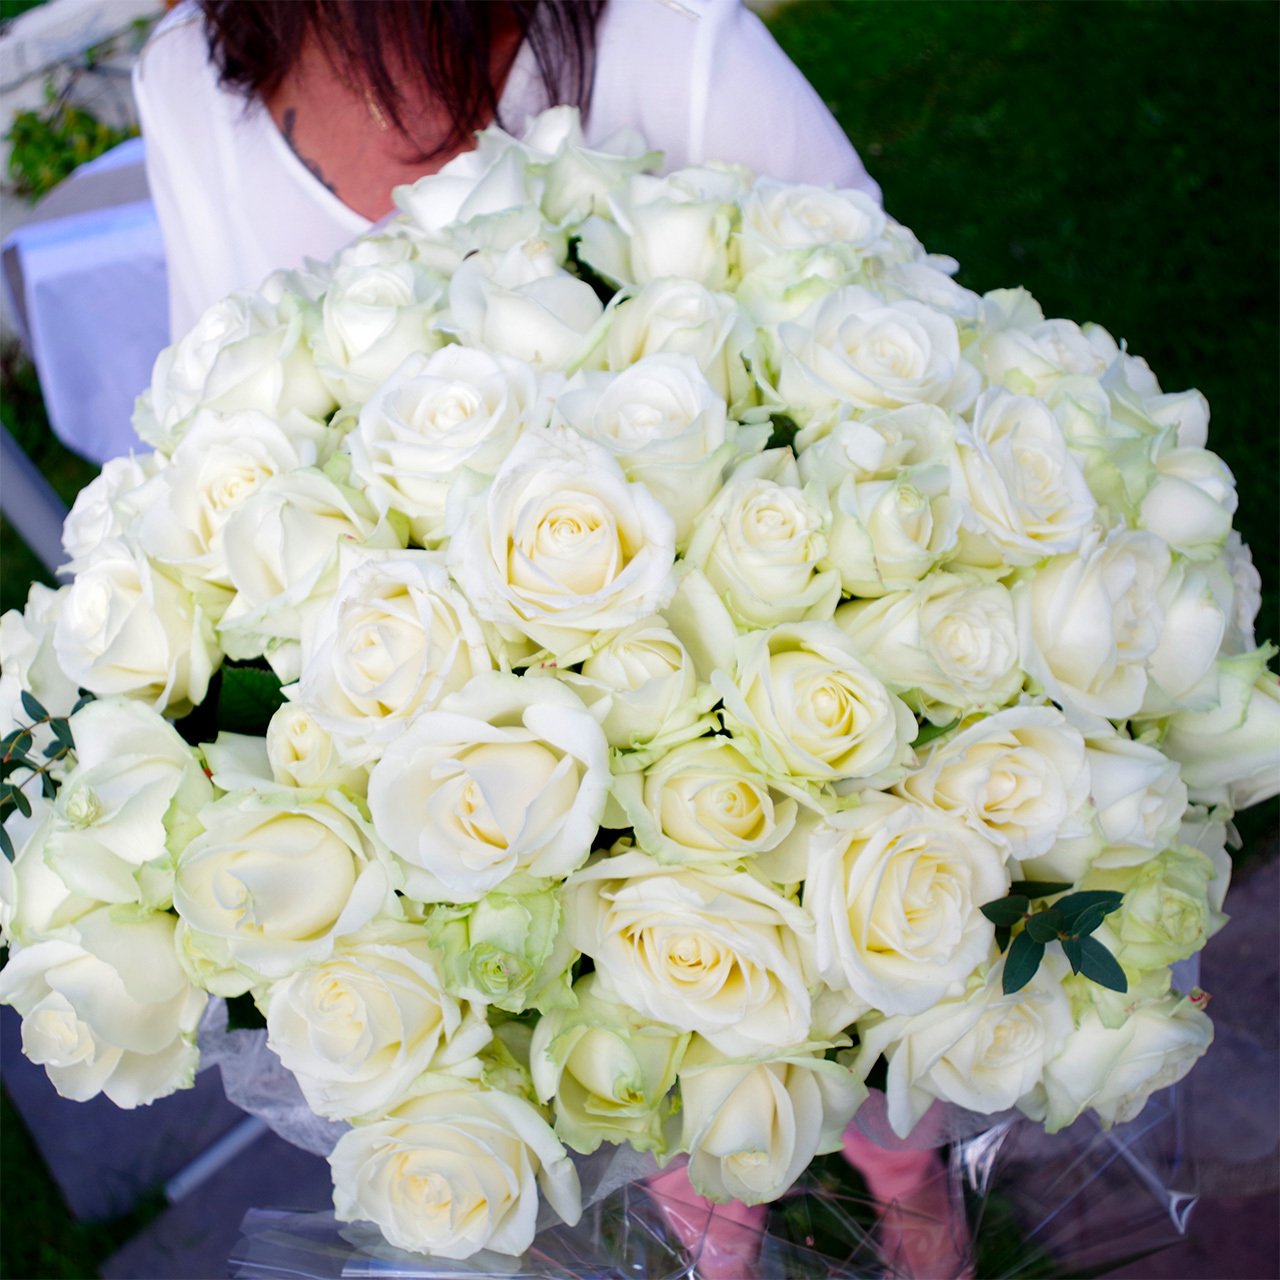 70 roses